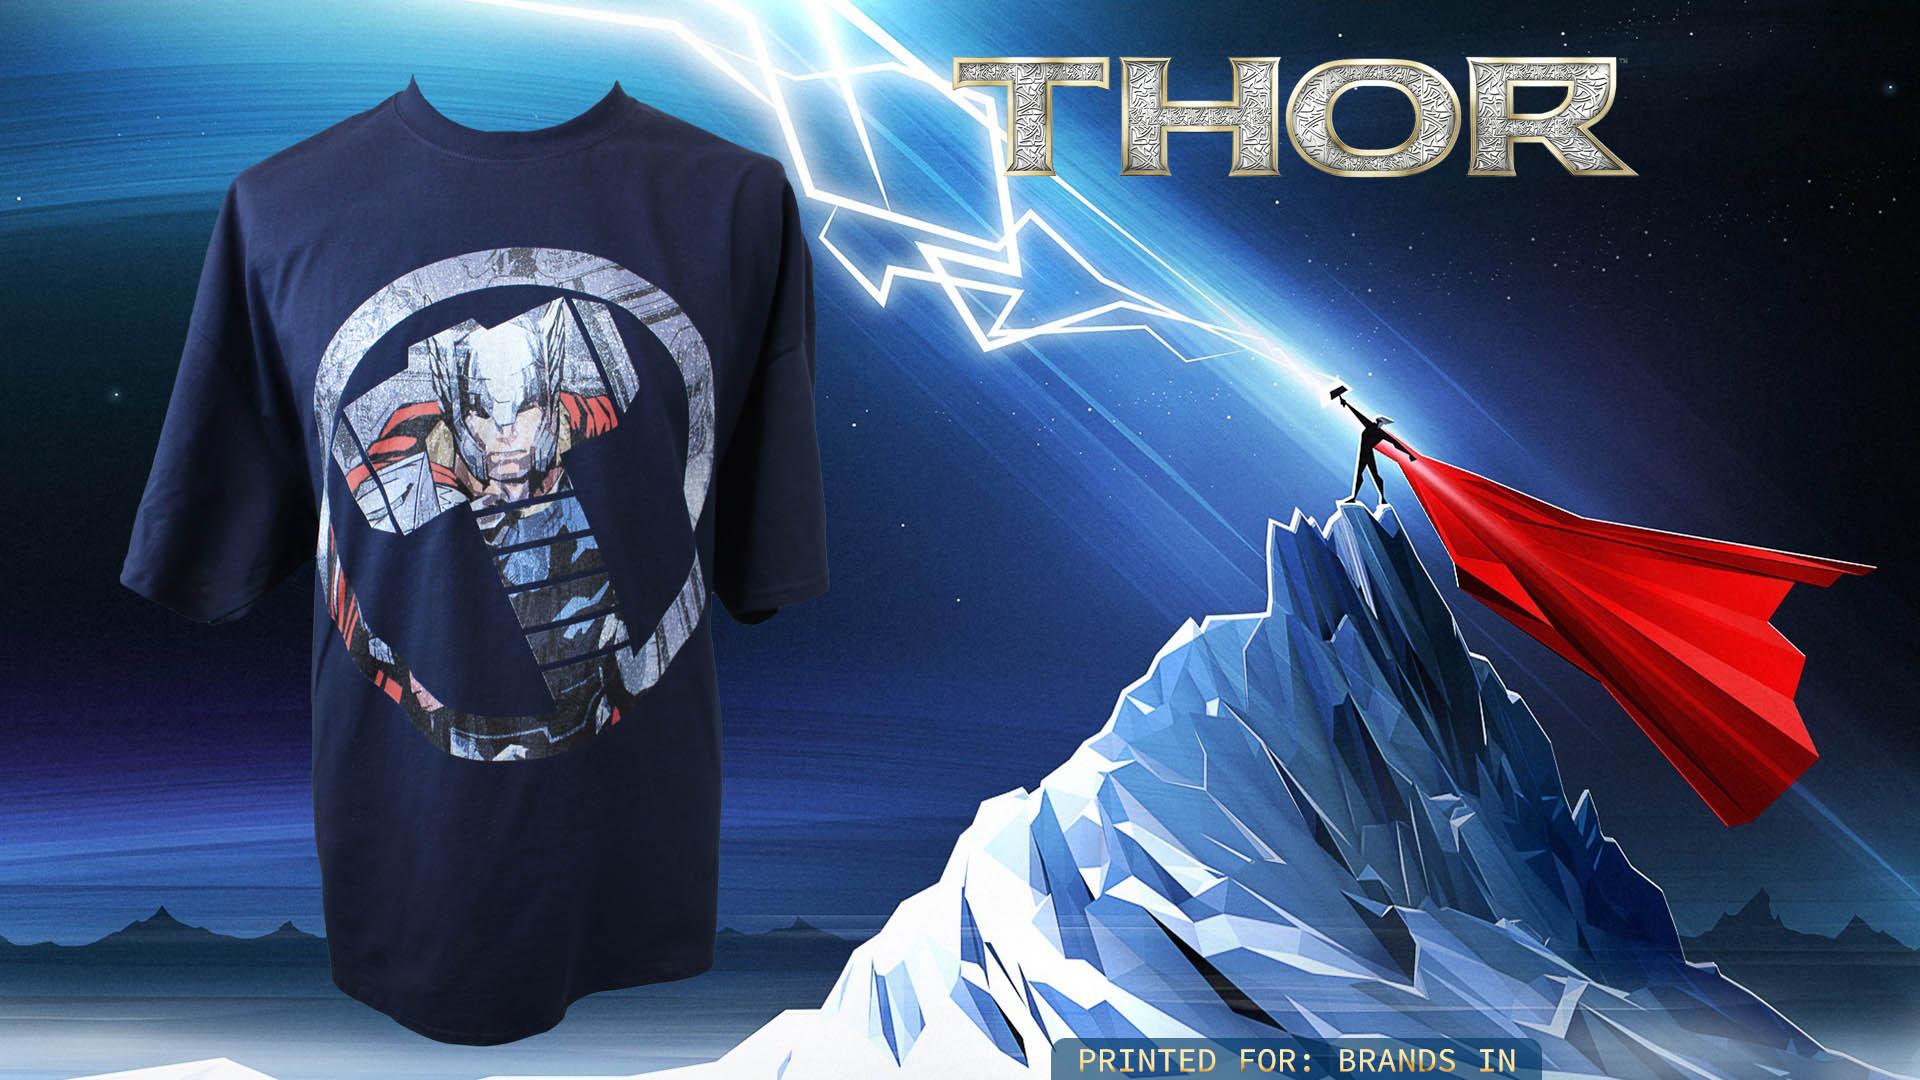 Shirt design brands - Dtg Printing Thor T Shirt Printing